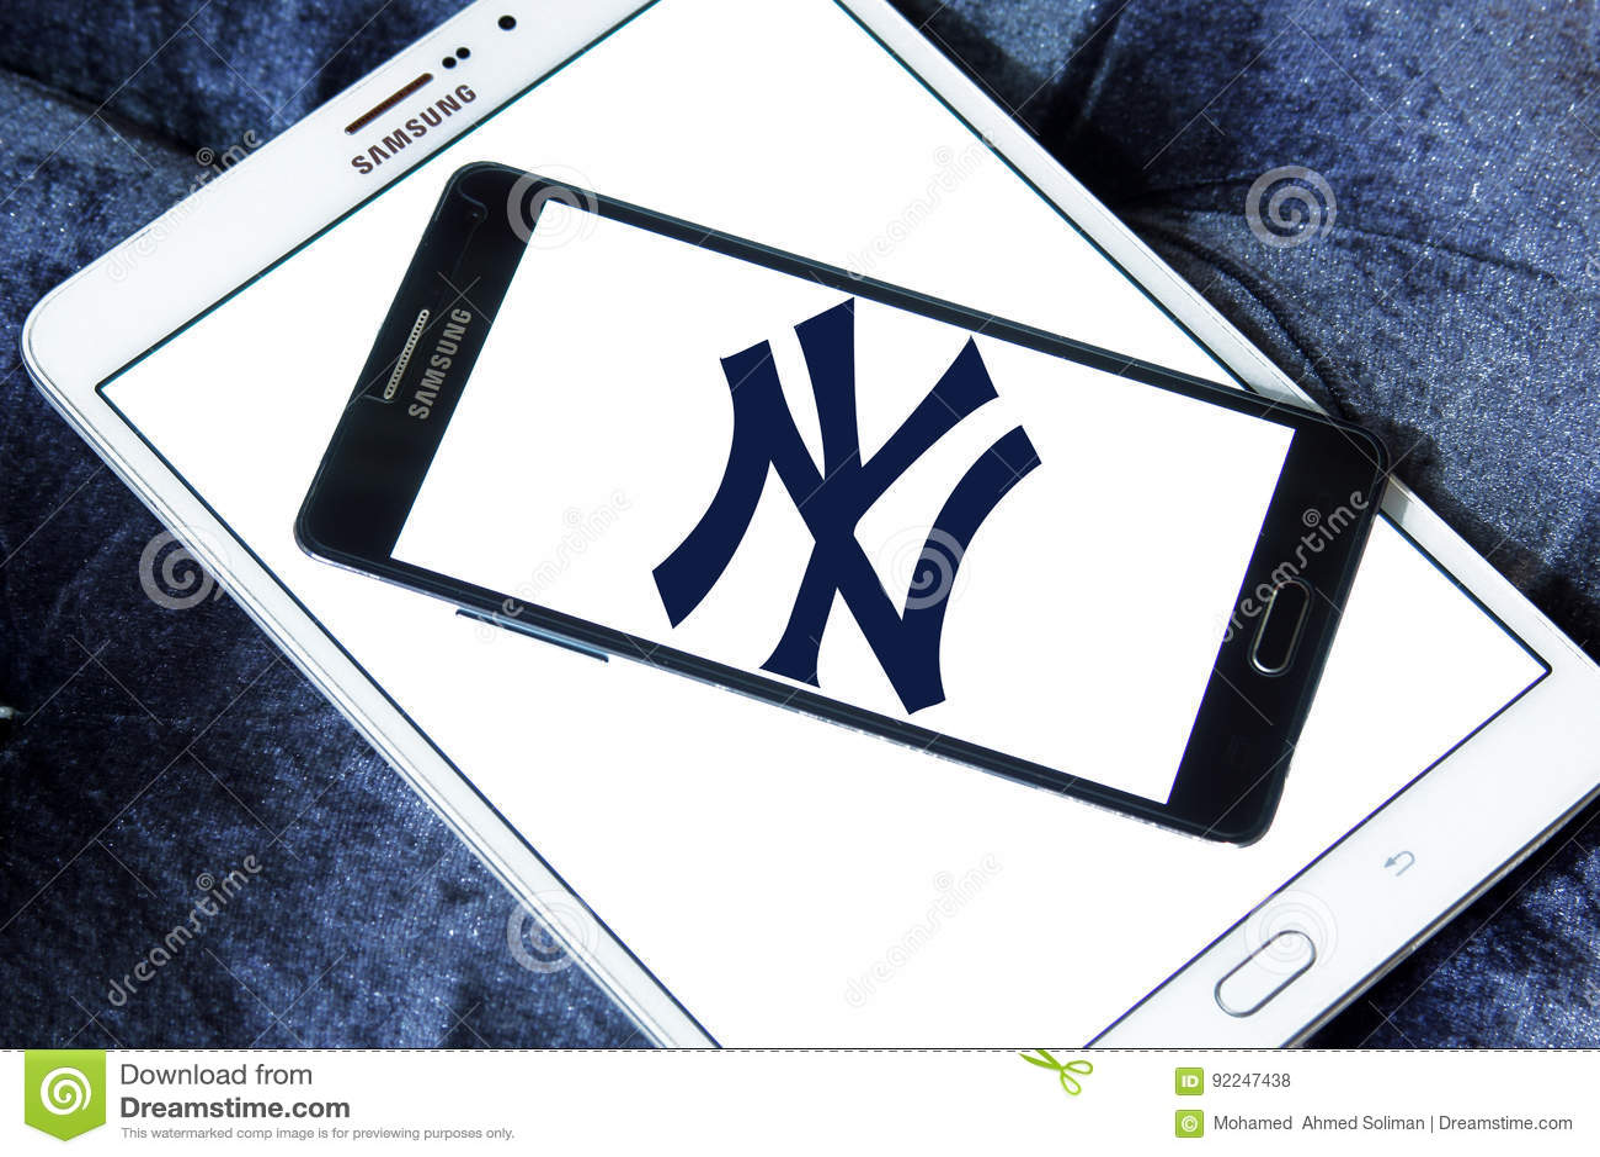 New york yankees ny baseball sports club logo editorial stock new york yankees ny baseball sports club logo teams worldwide biocorpaavc Images